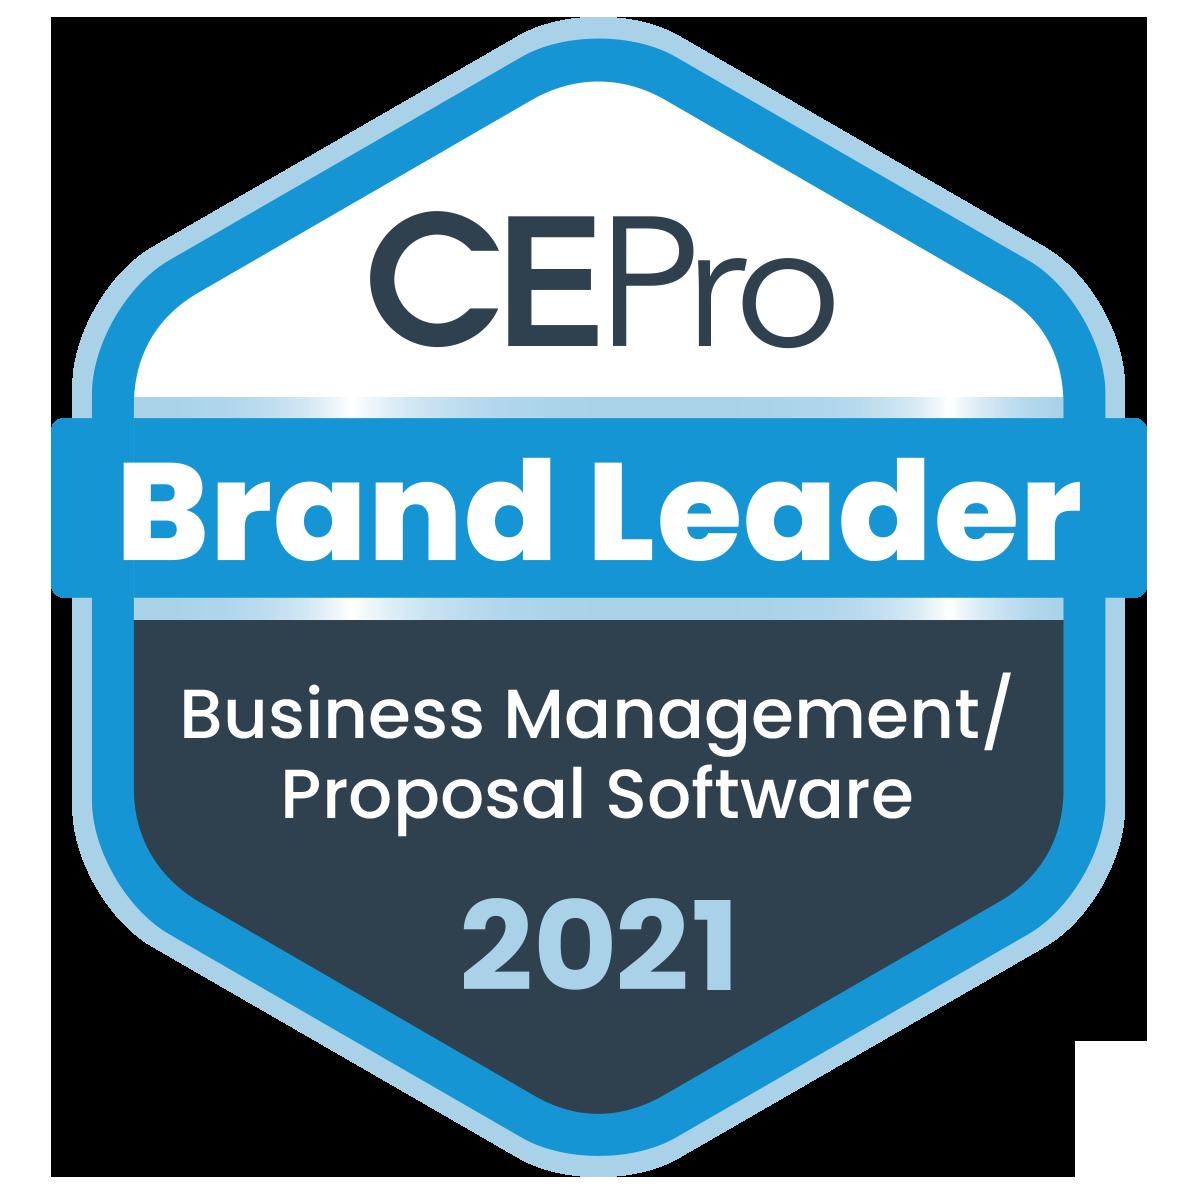 CEPro-Brand-Leaders-2021-2